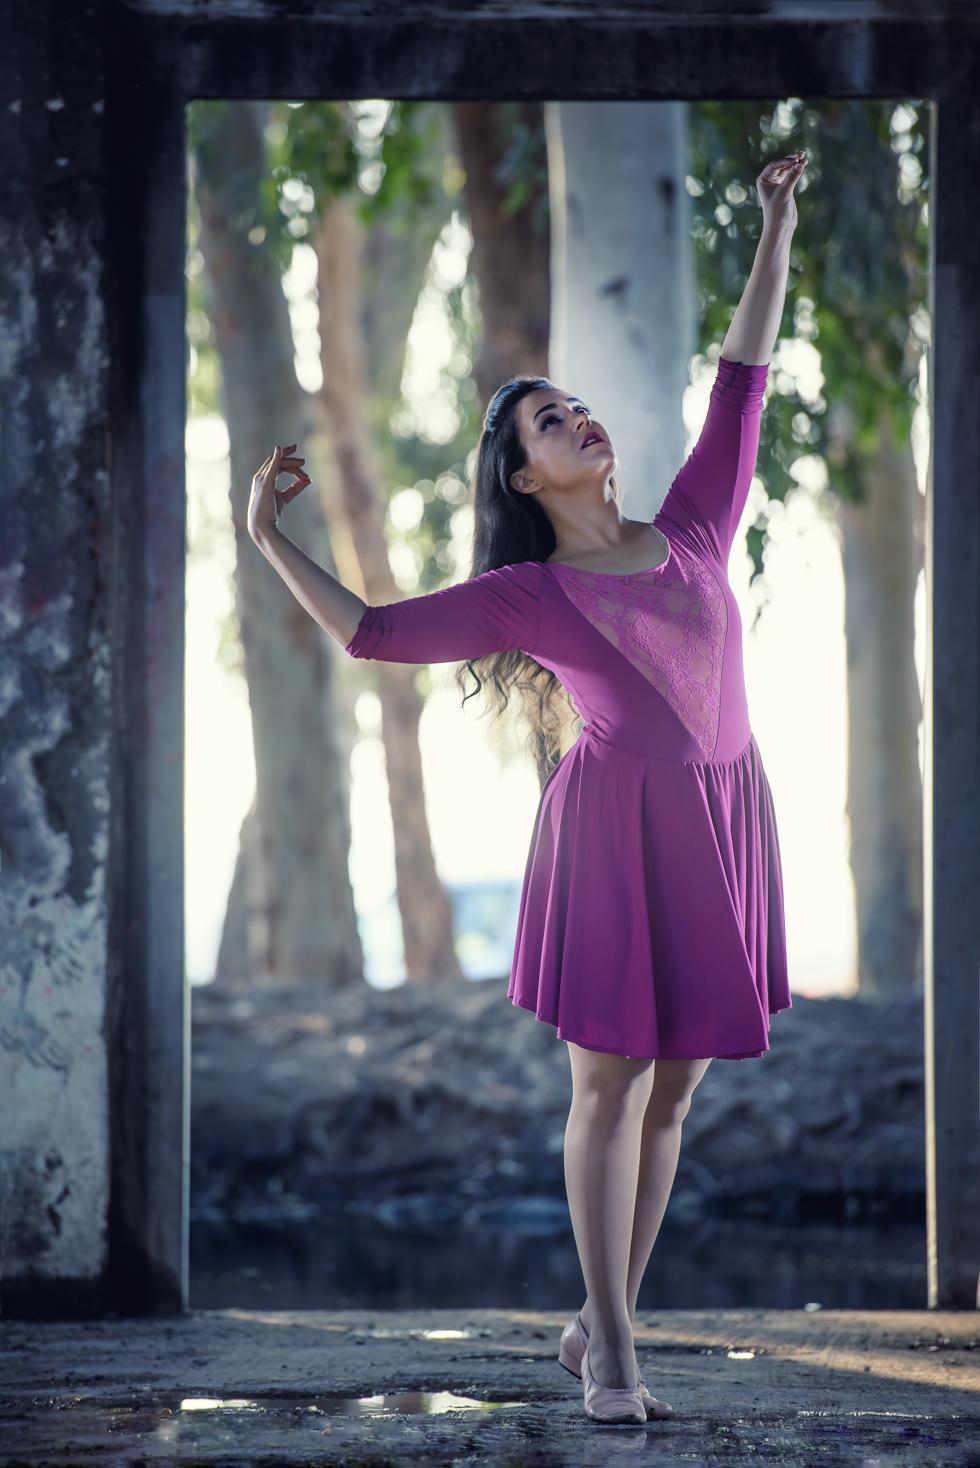 Dancer's Project - Yafit Moyal 003.jpg